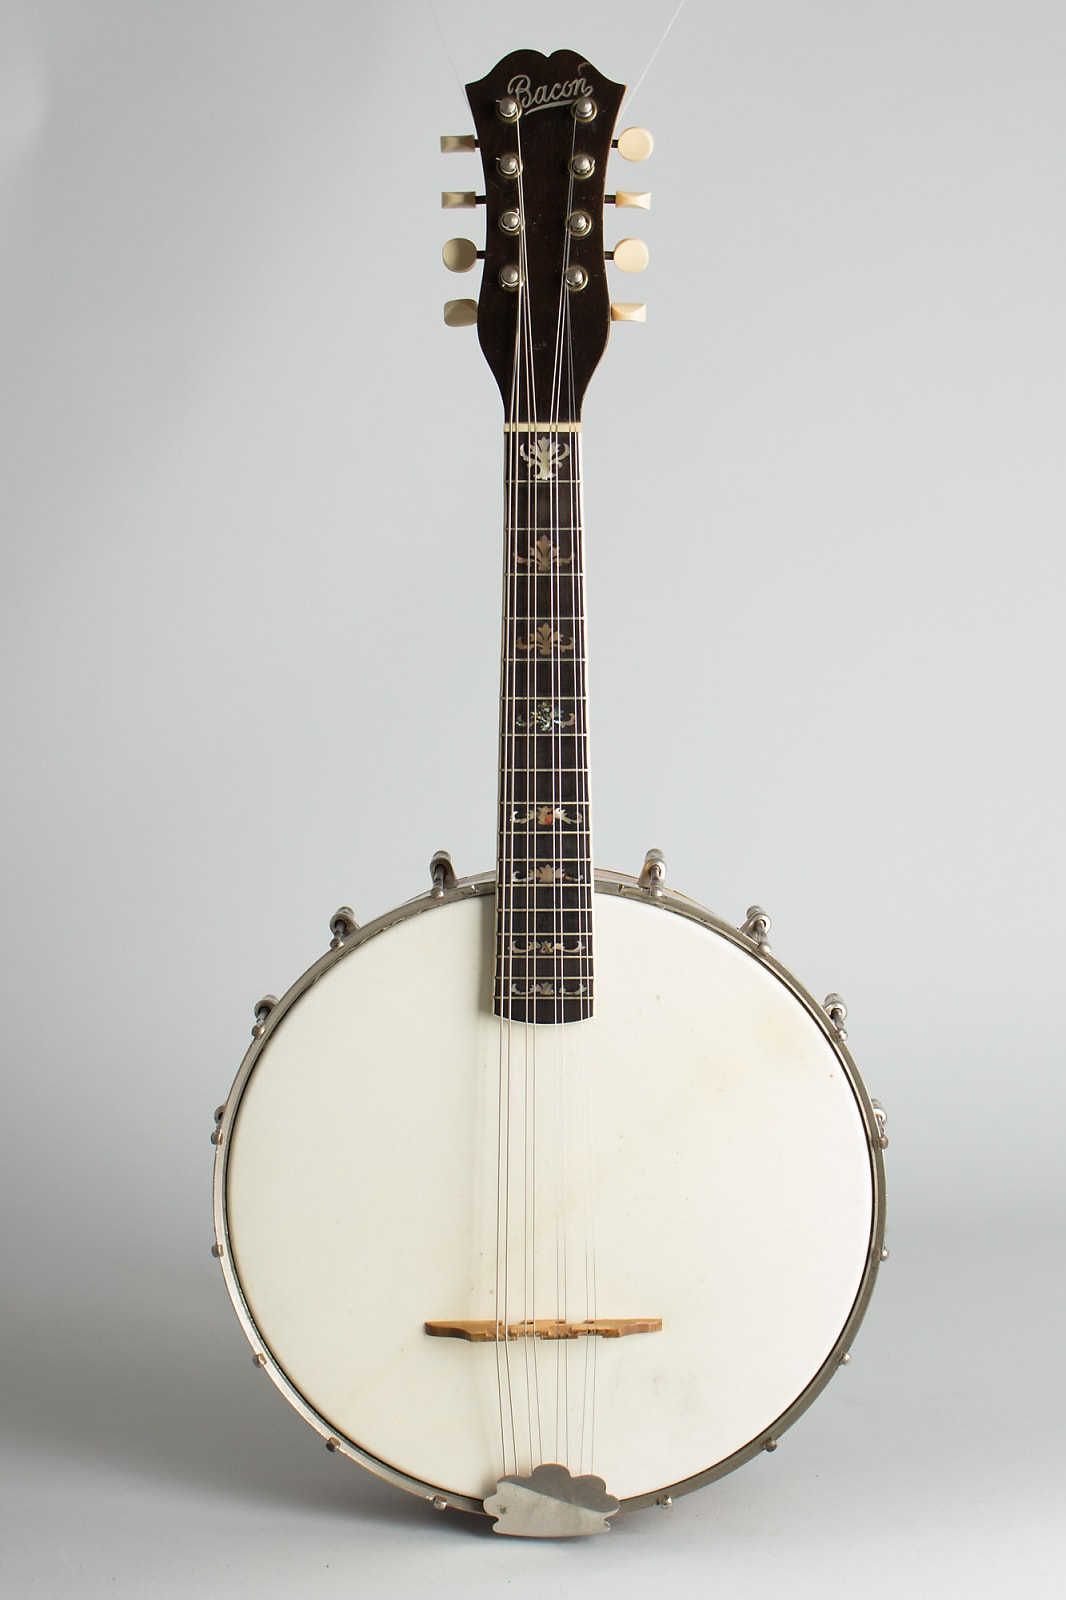 Bacon  Orchestra Style B Mandolin Banjo,  c. 1917, original black hard shell case.